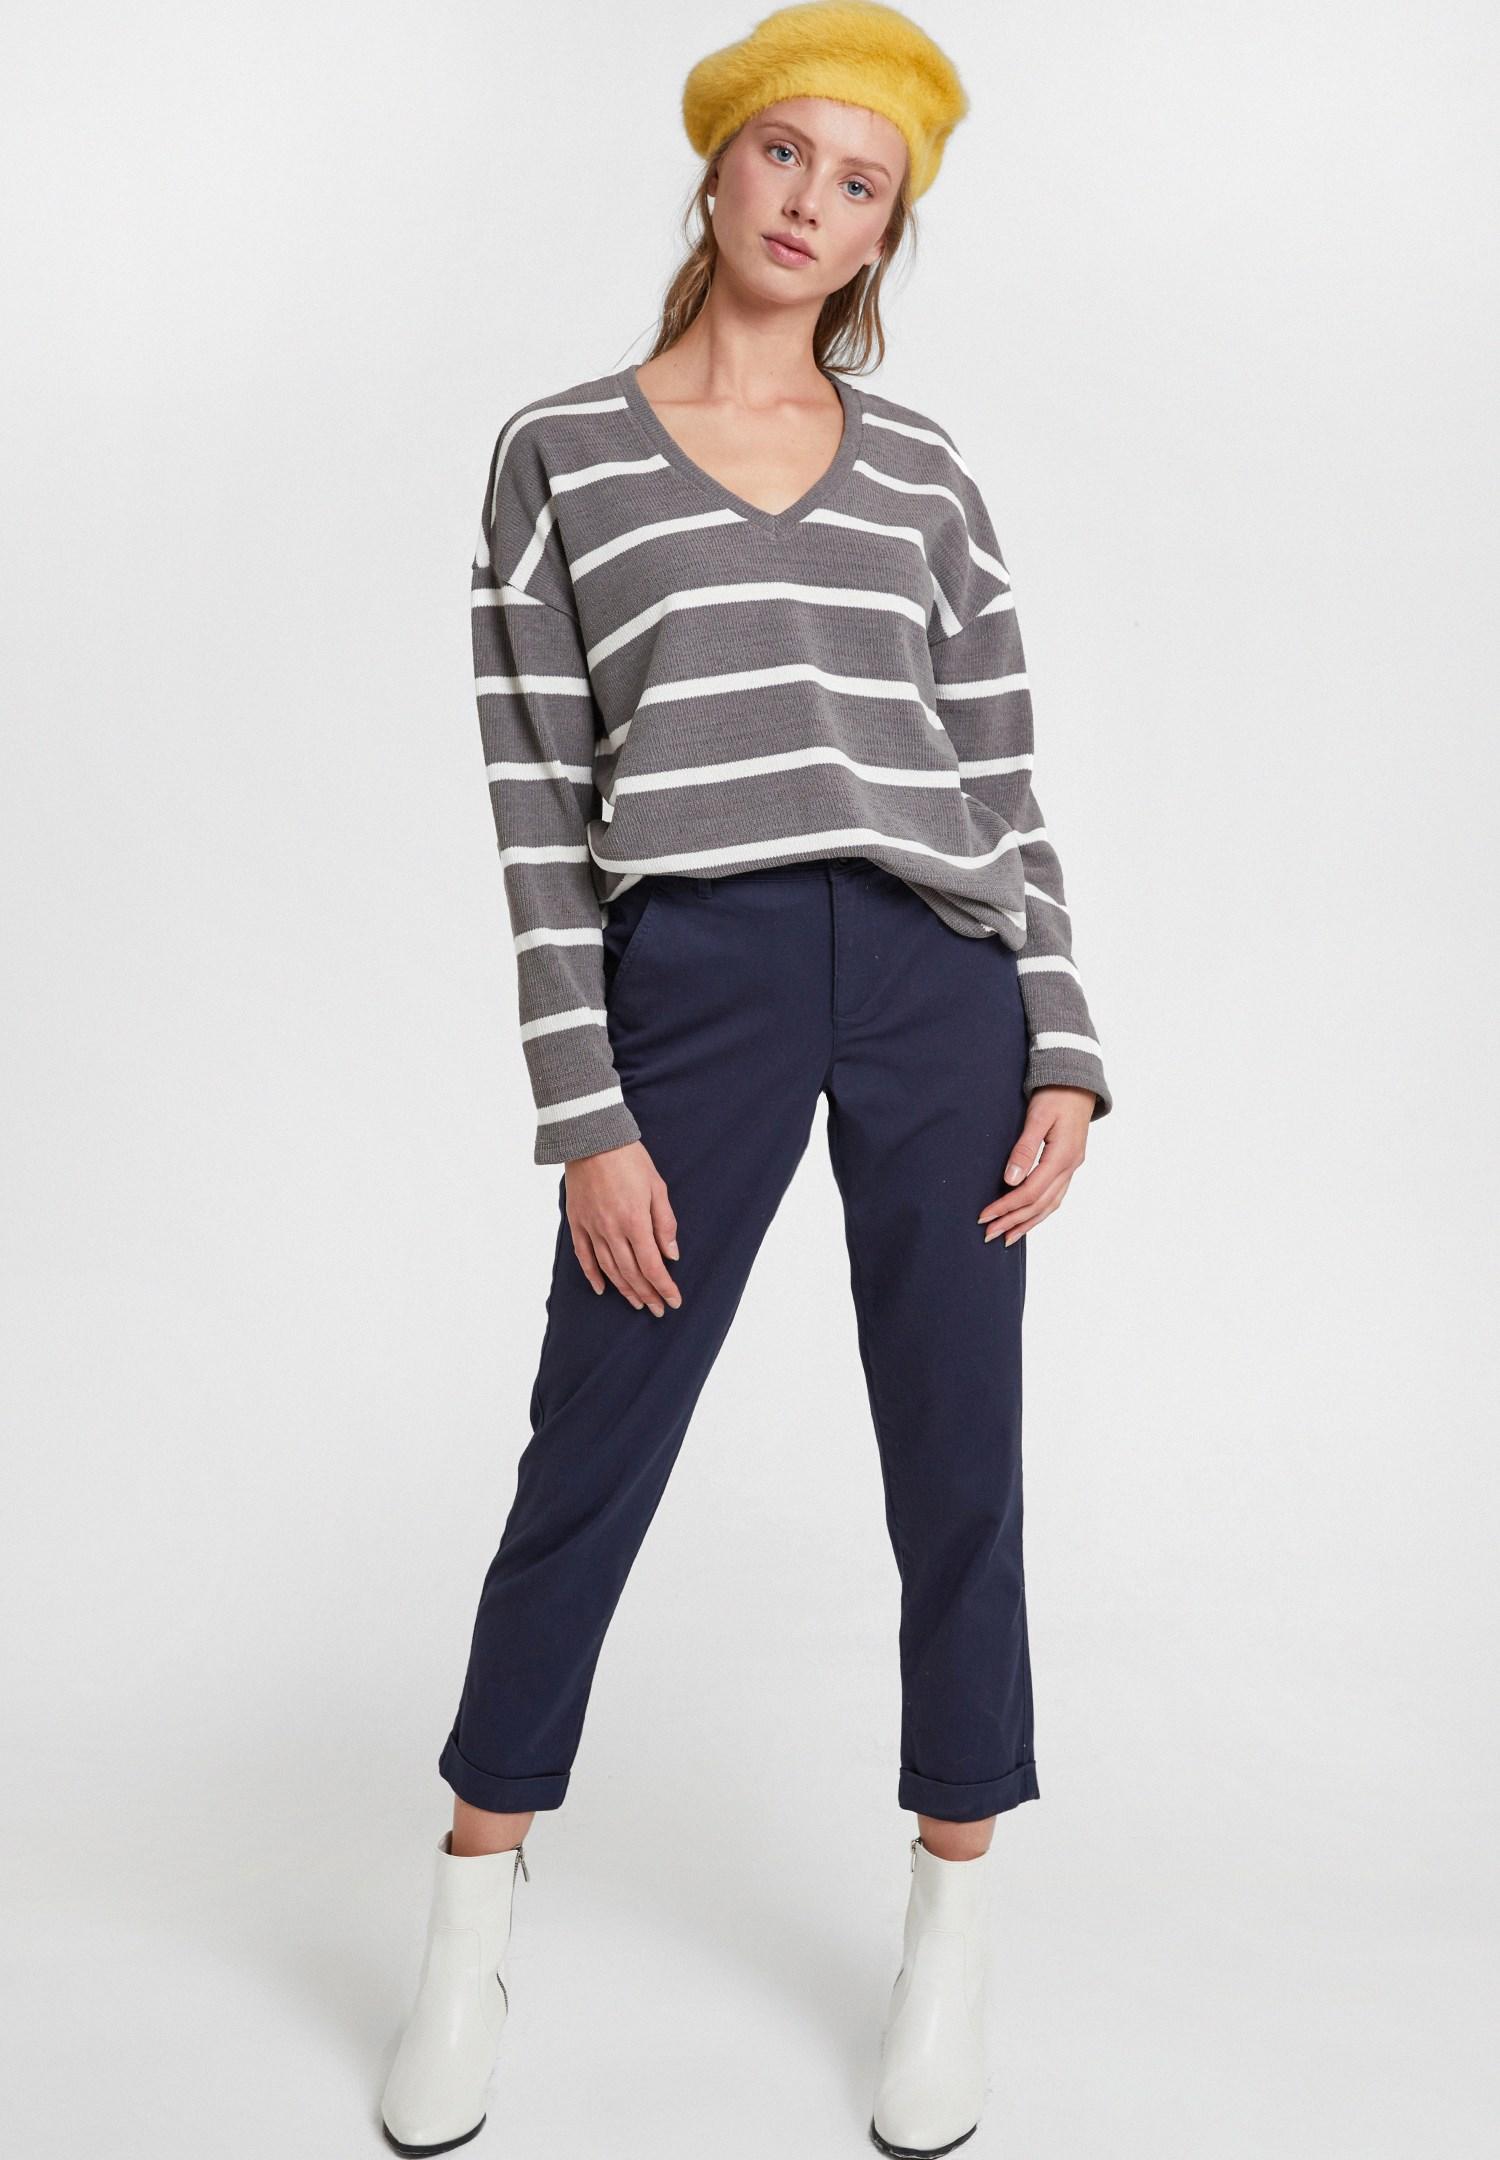 Bayan Lacivert Yüksek Bel Detaylı Boru Paça Pantolon